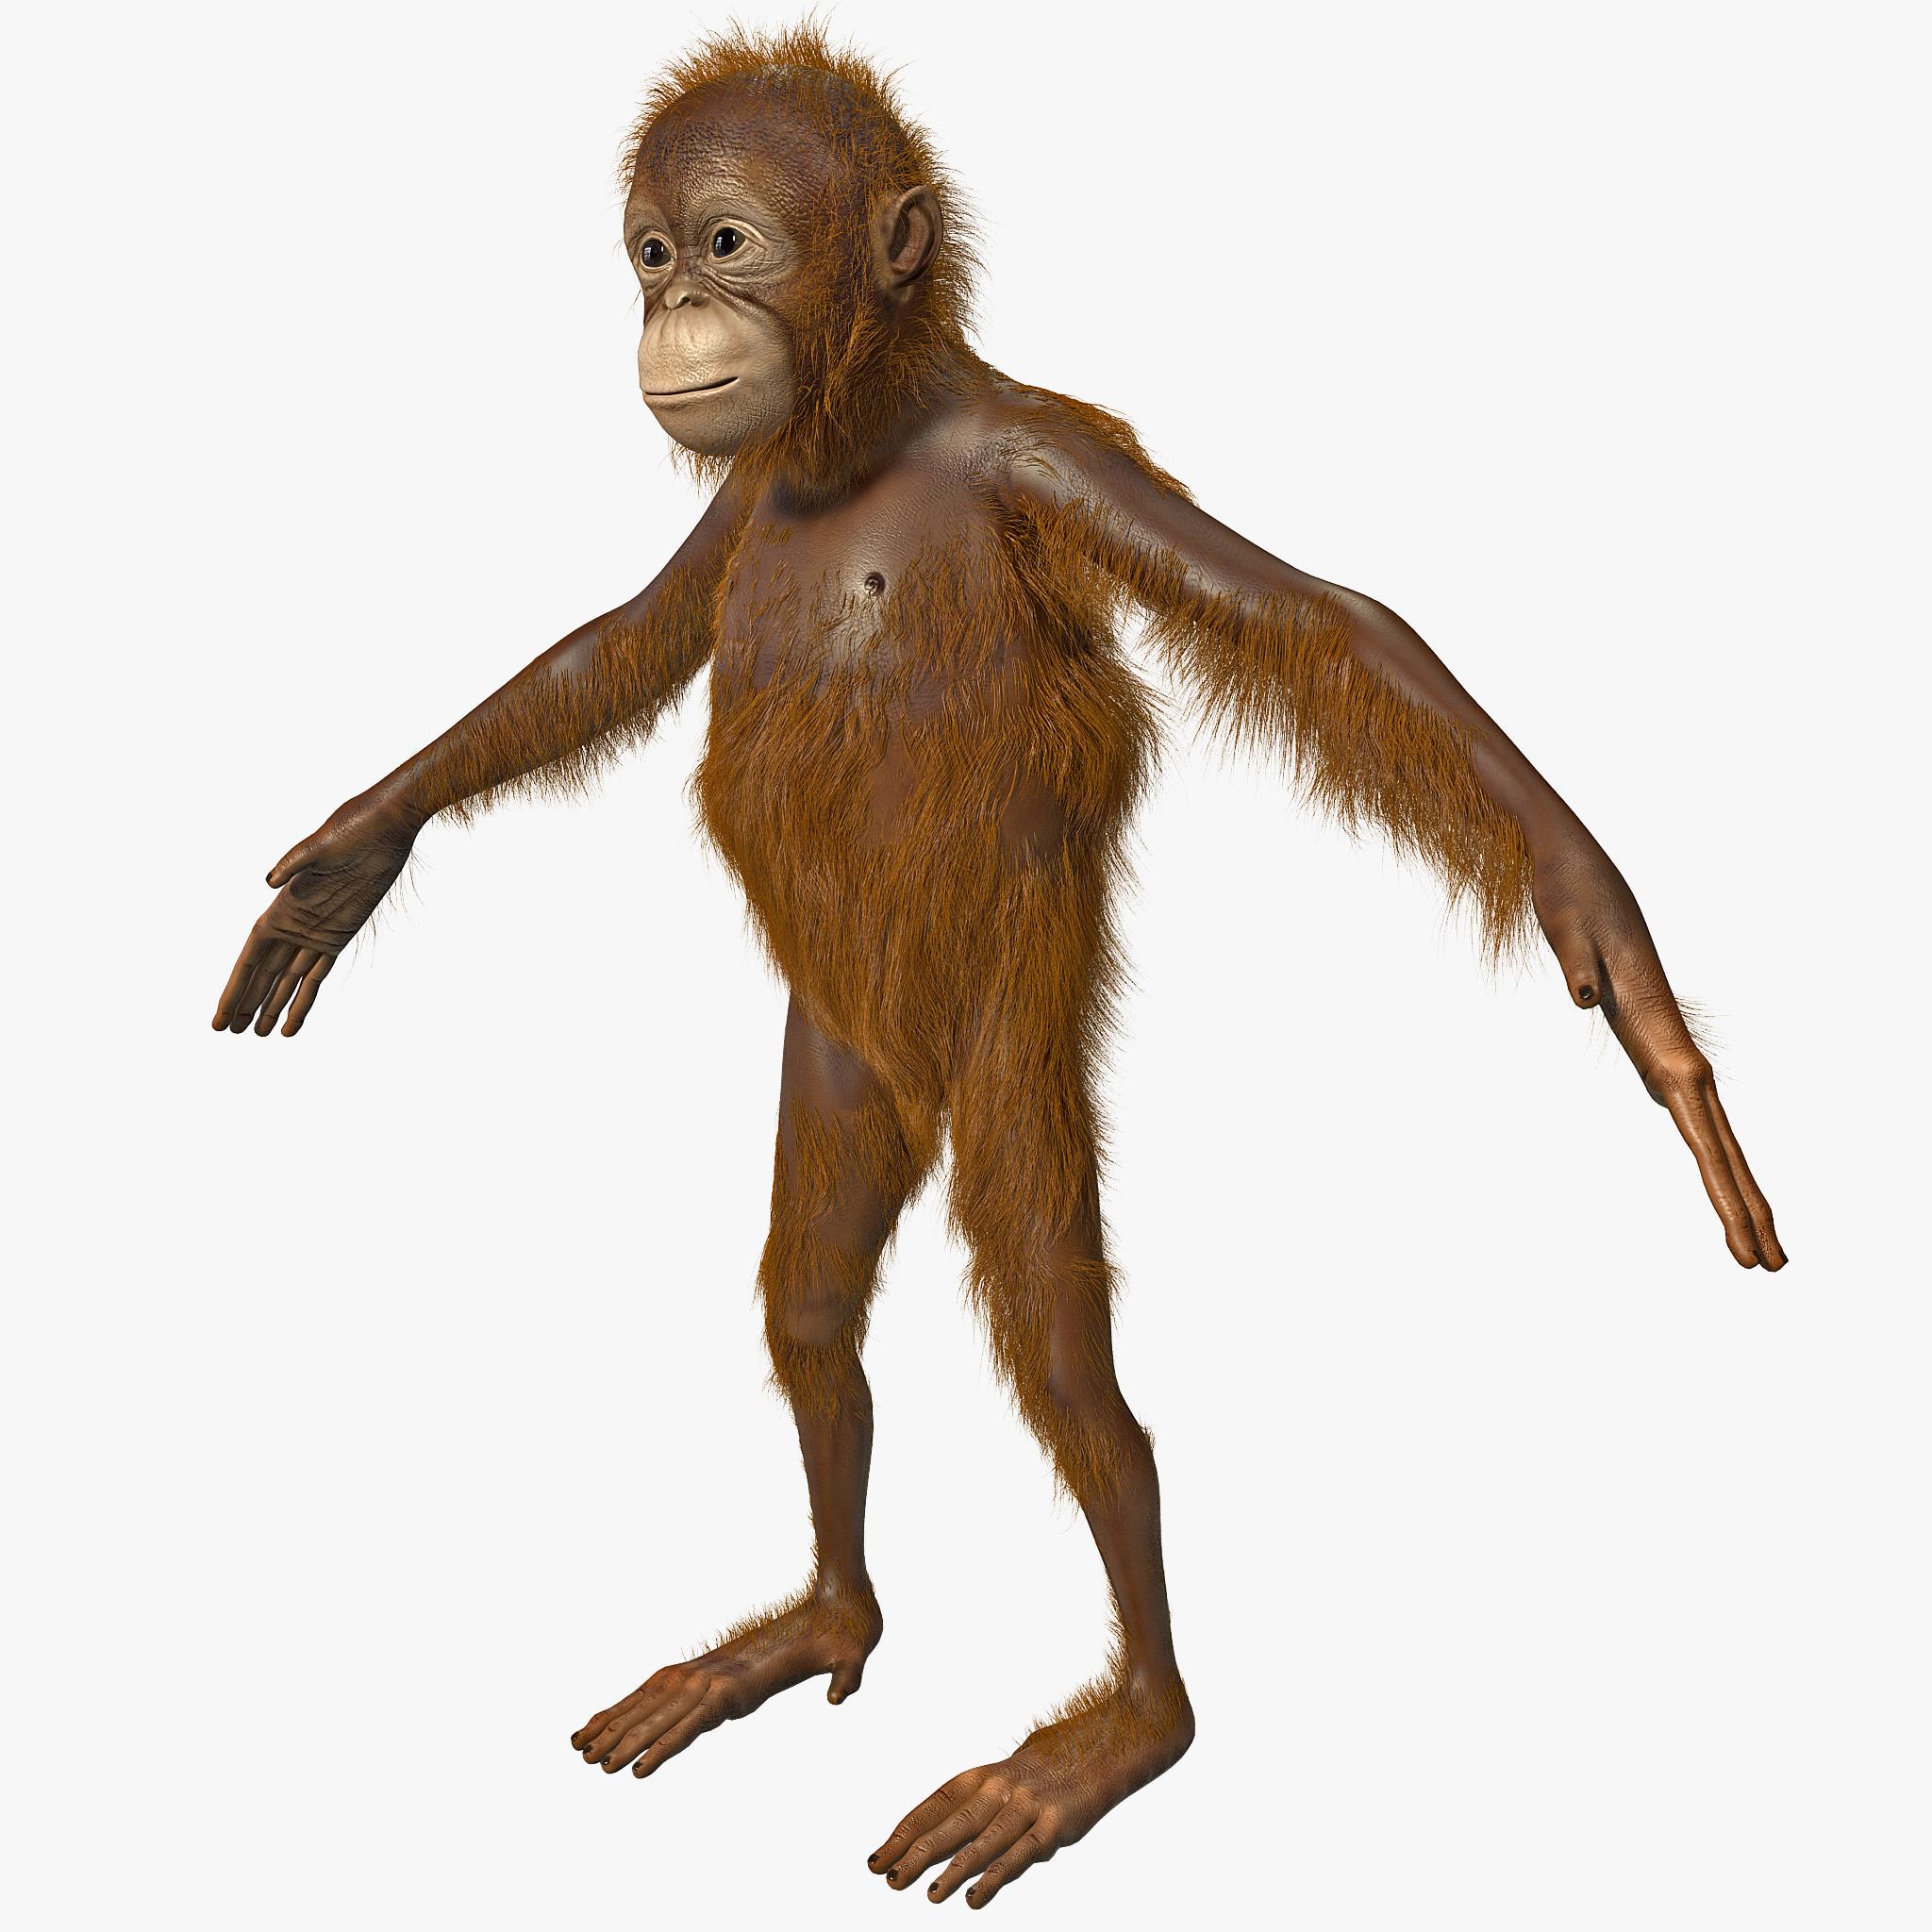 Orangutan-human hentai erotic download